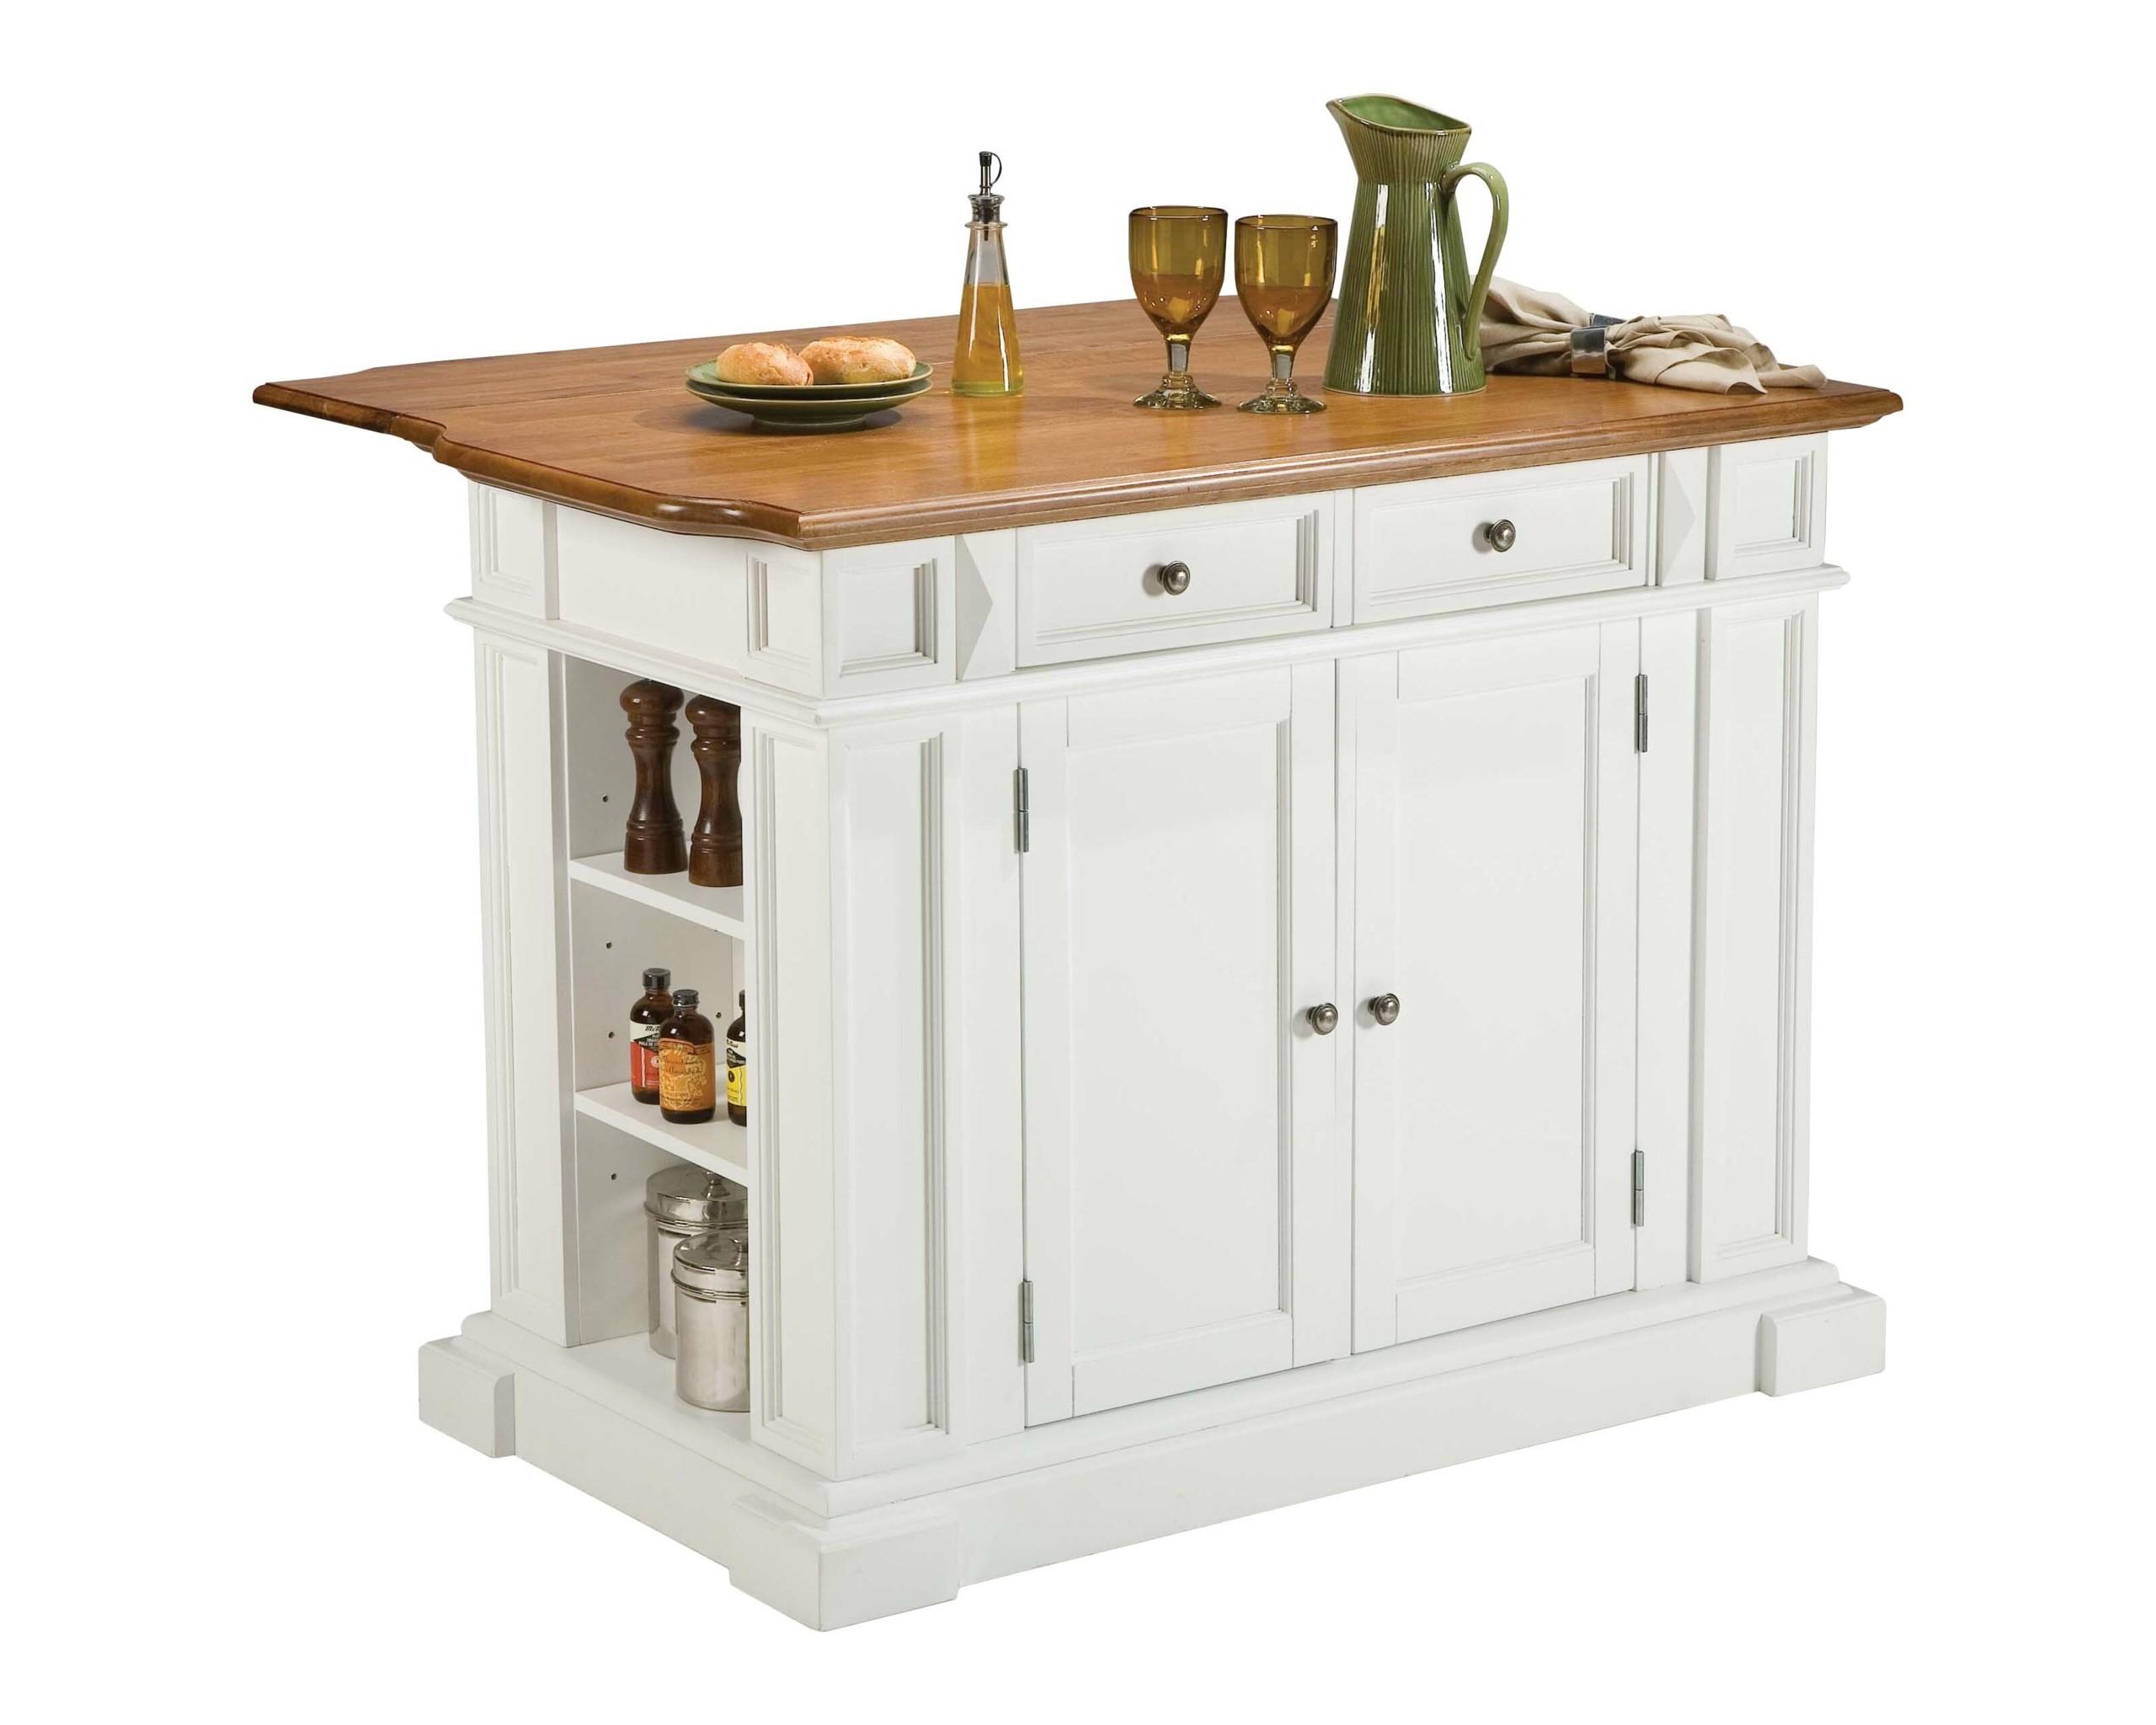 Drop Leaf Kitchen Island Table Ideas On Foter